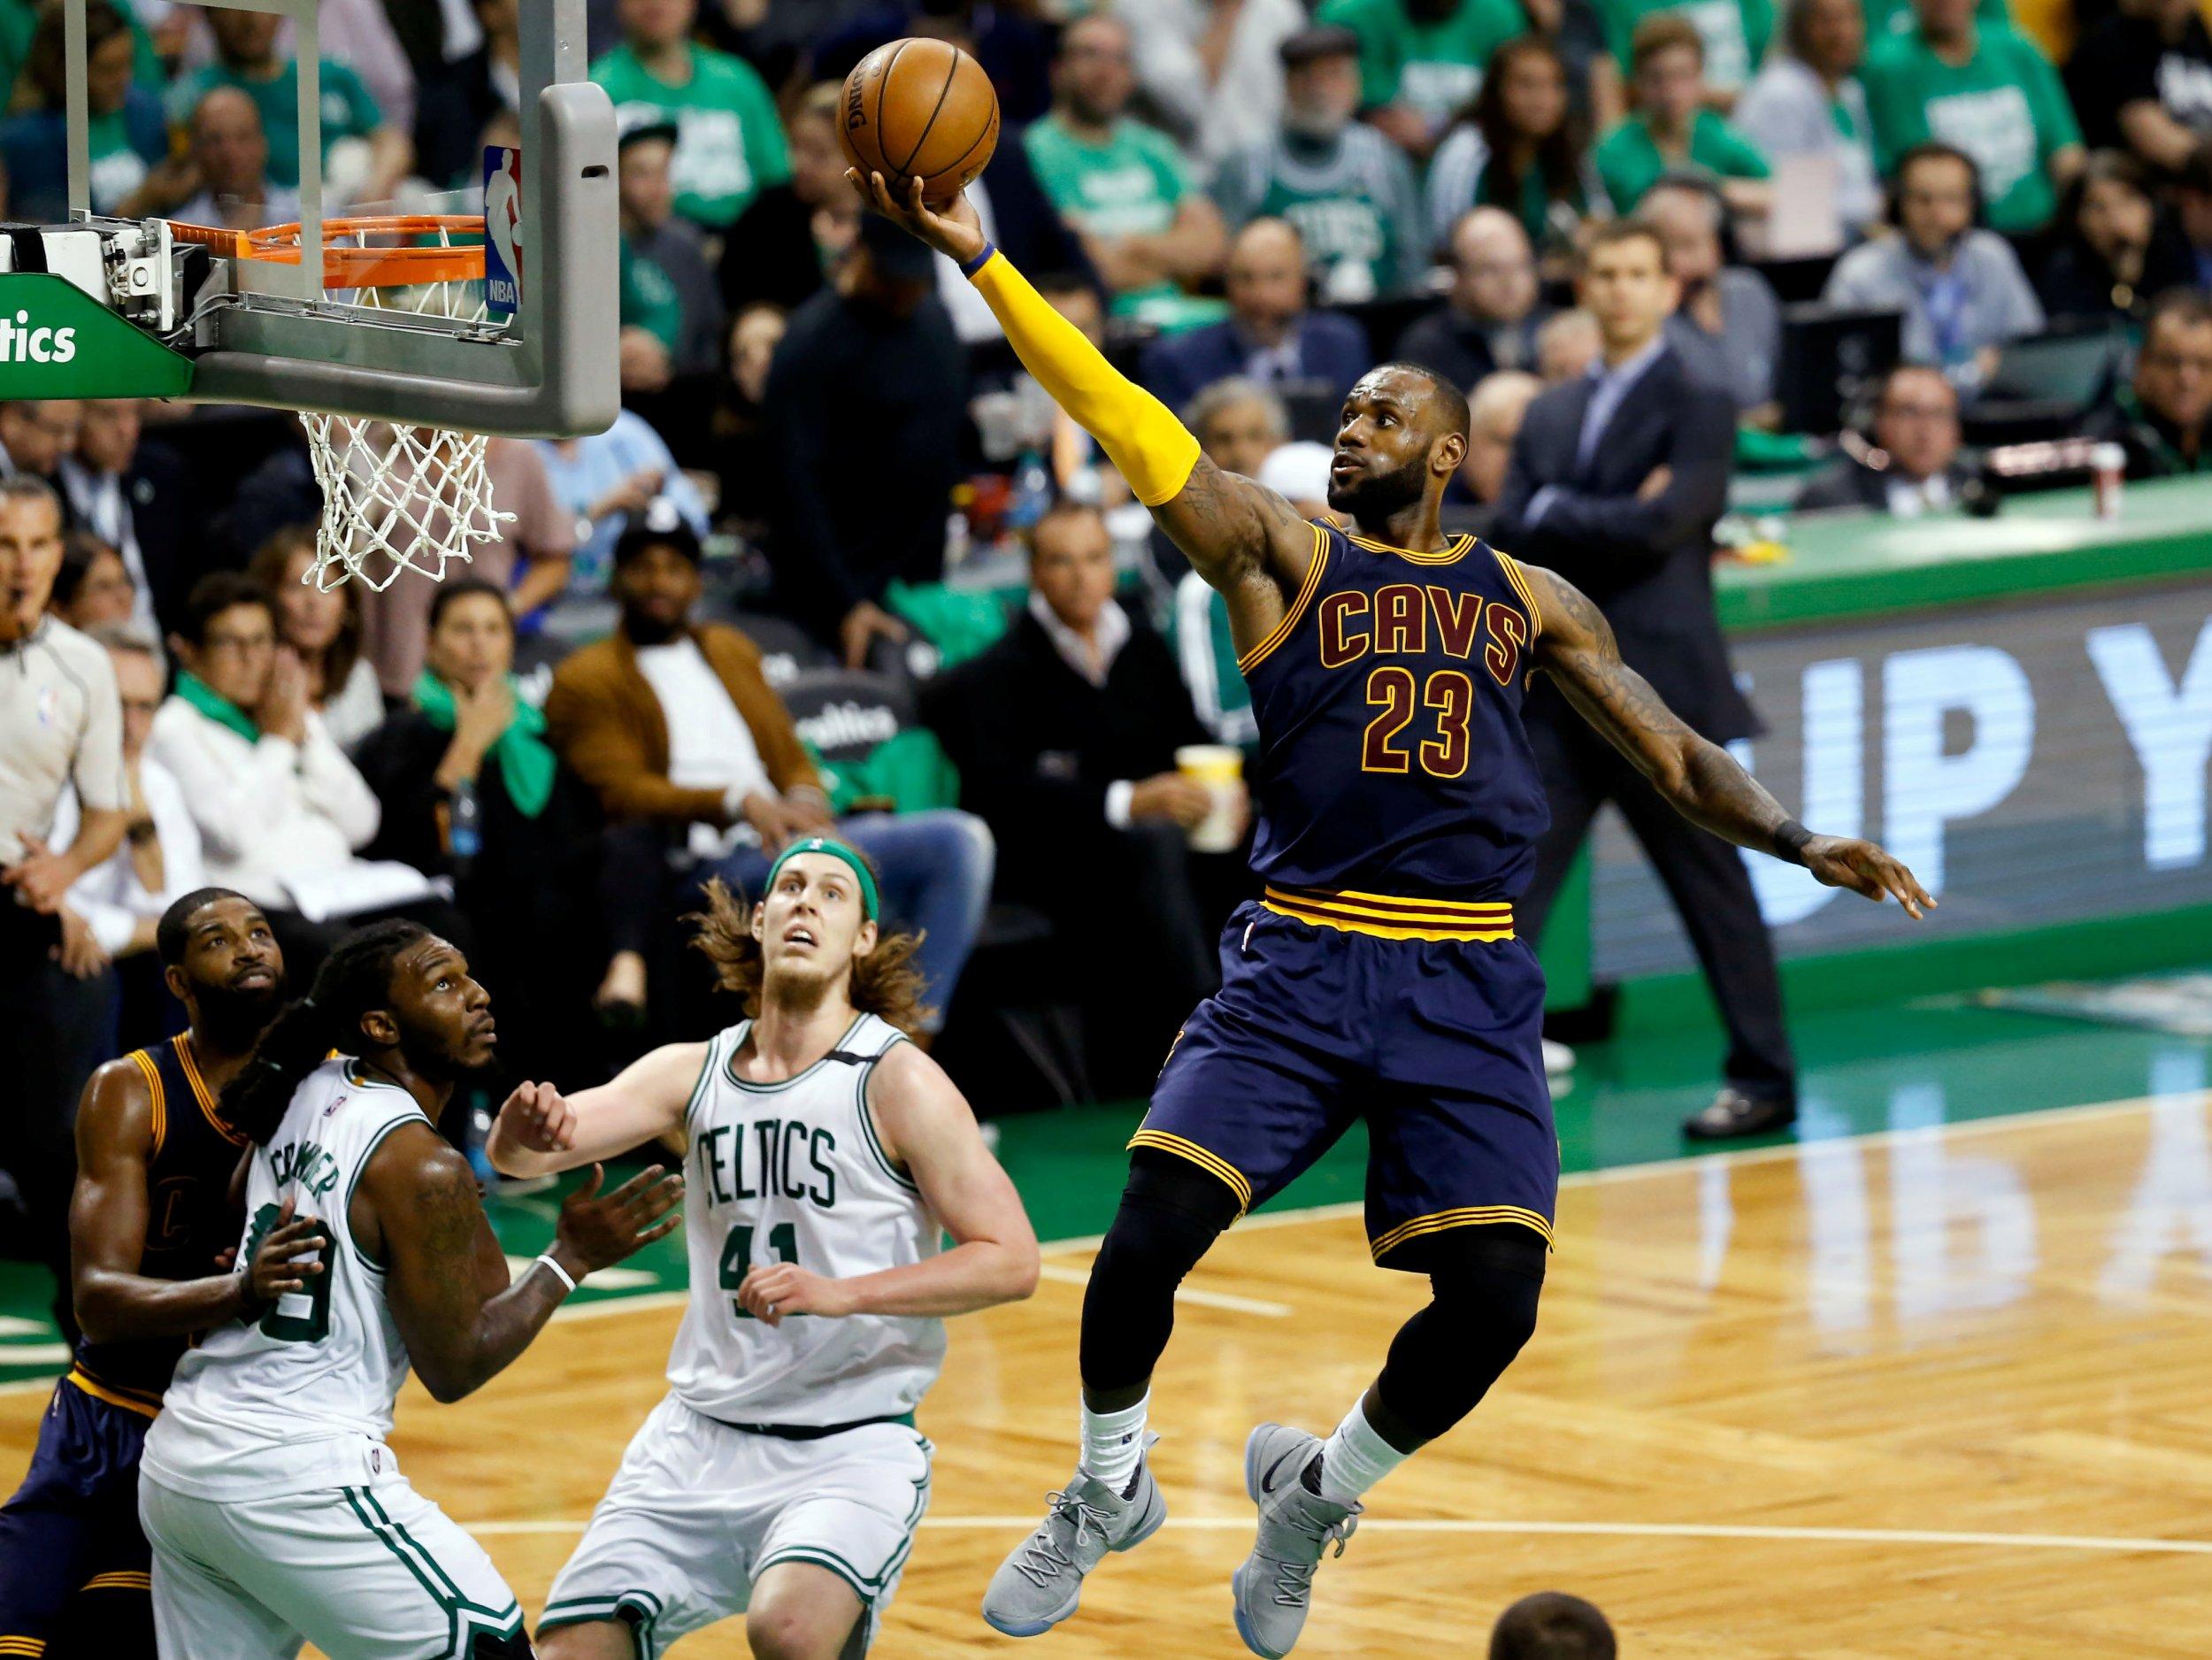 NBA Playoffs 2017: LeBron James Passes Michael Jordan to Become Playoff Scoring Leader